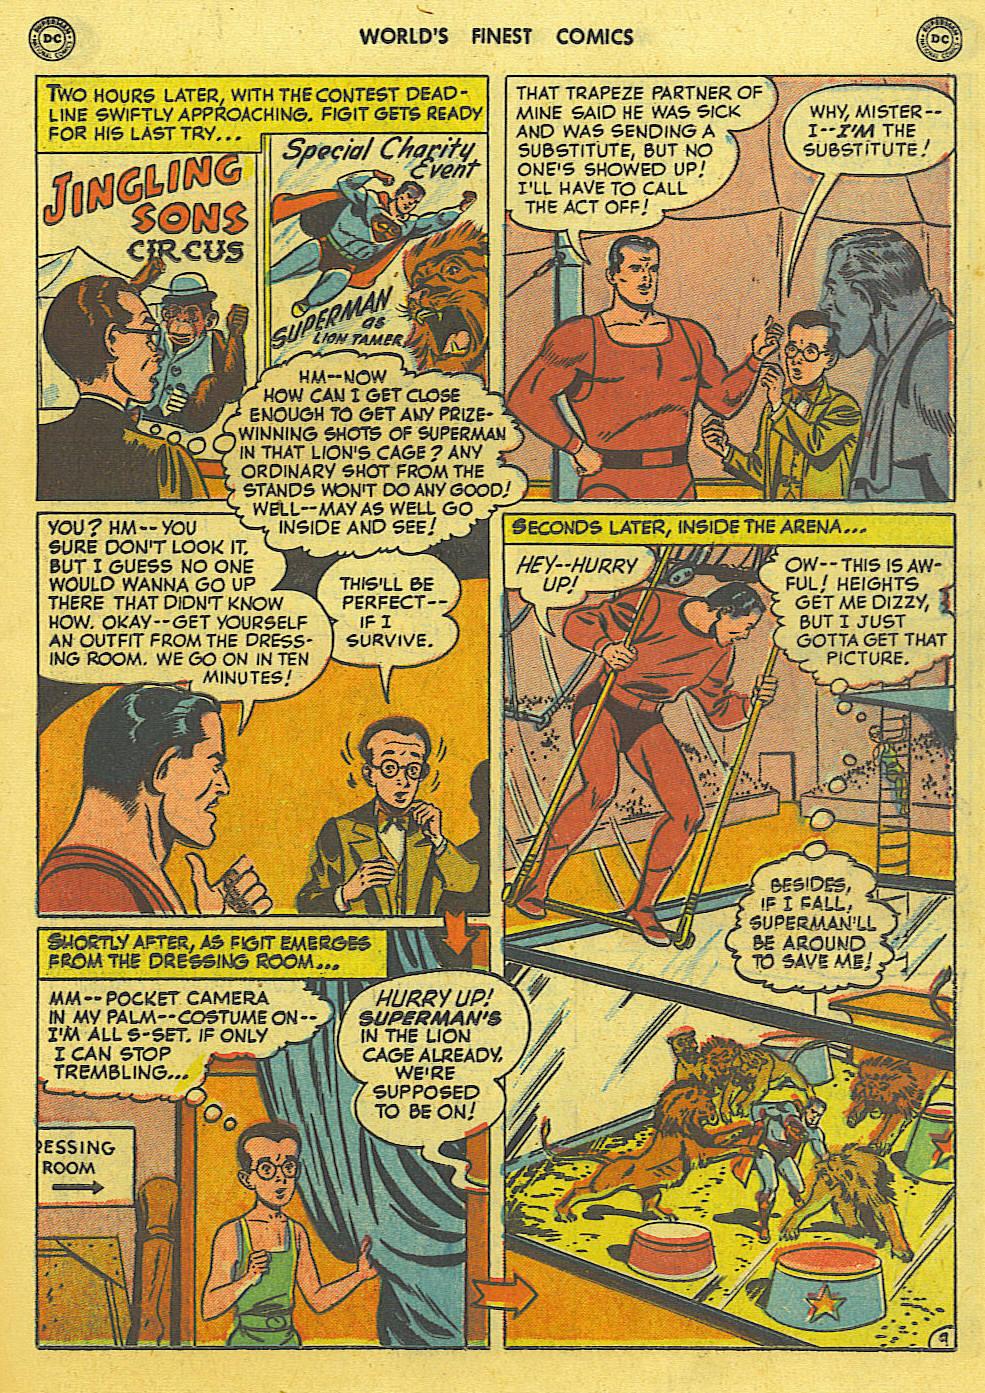 Read online World's Finest Comics comic -  Issue #49 - 12